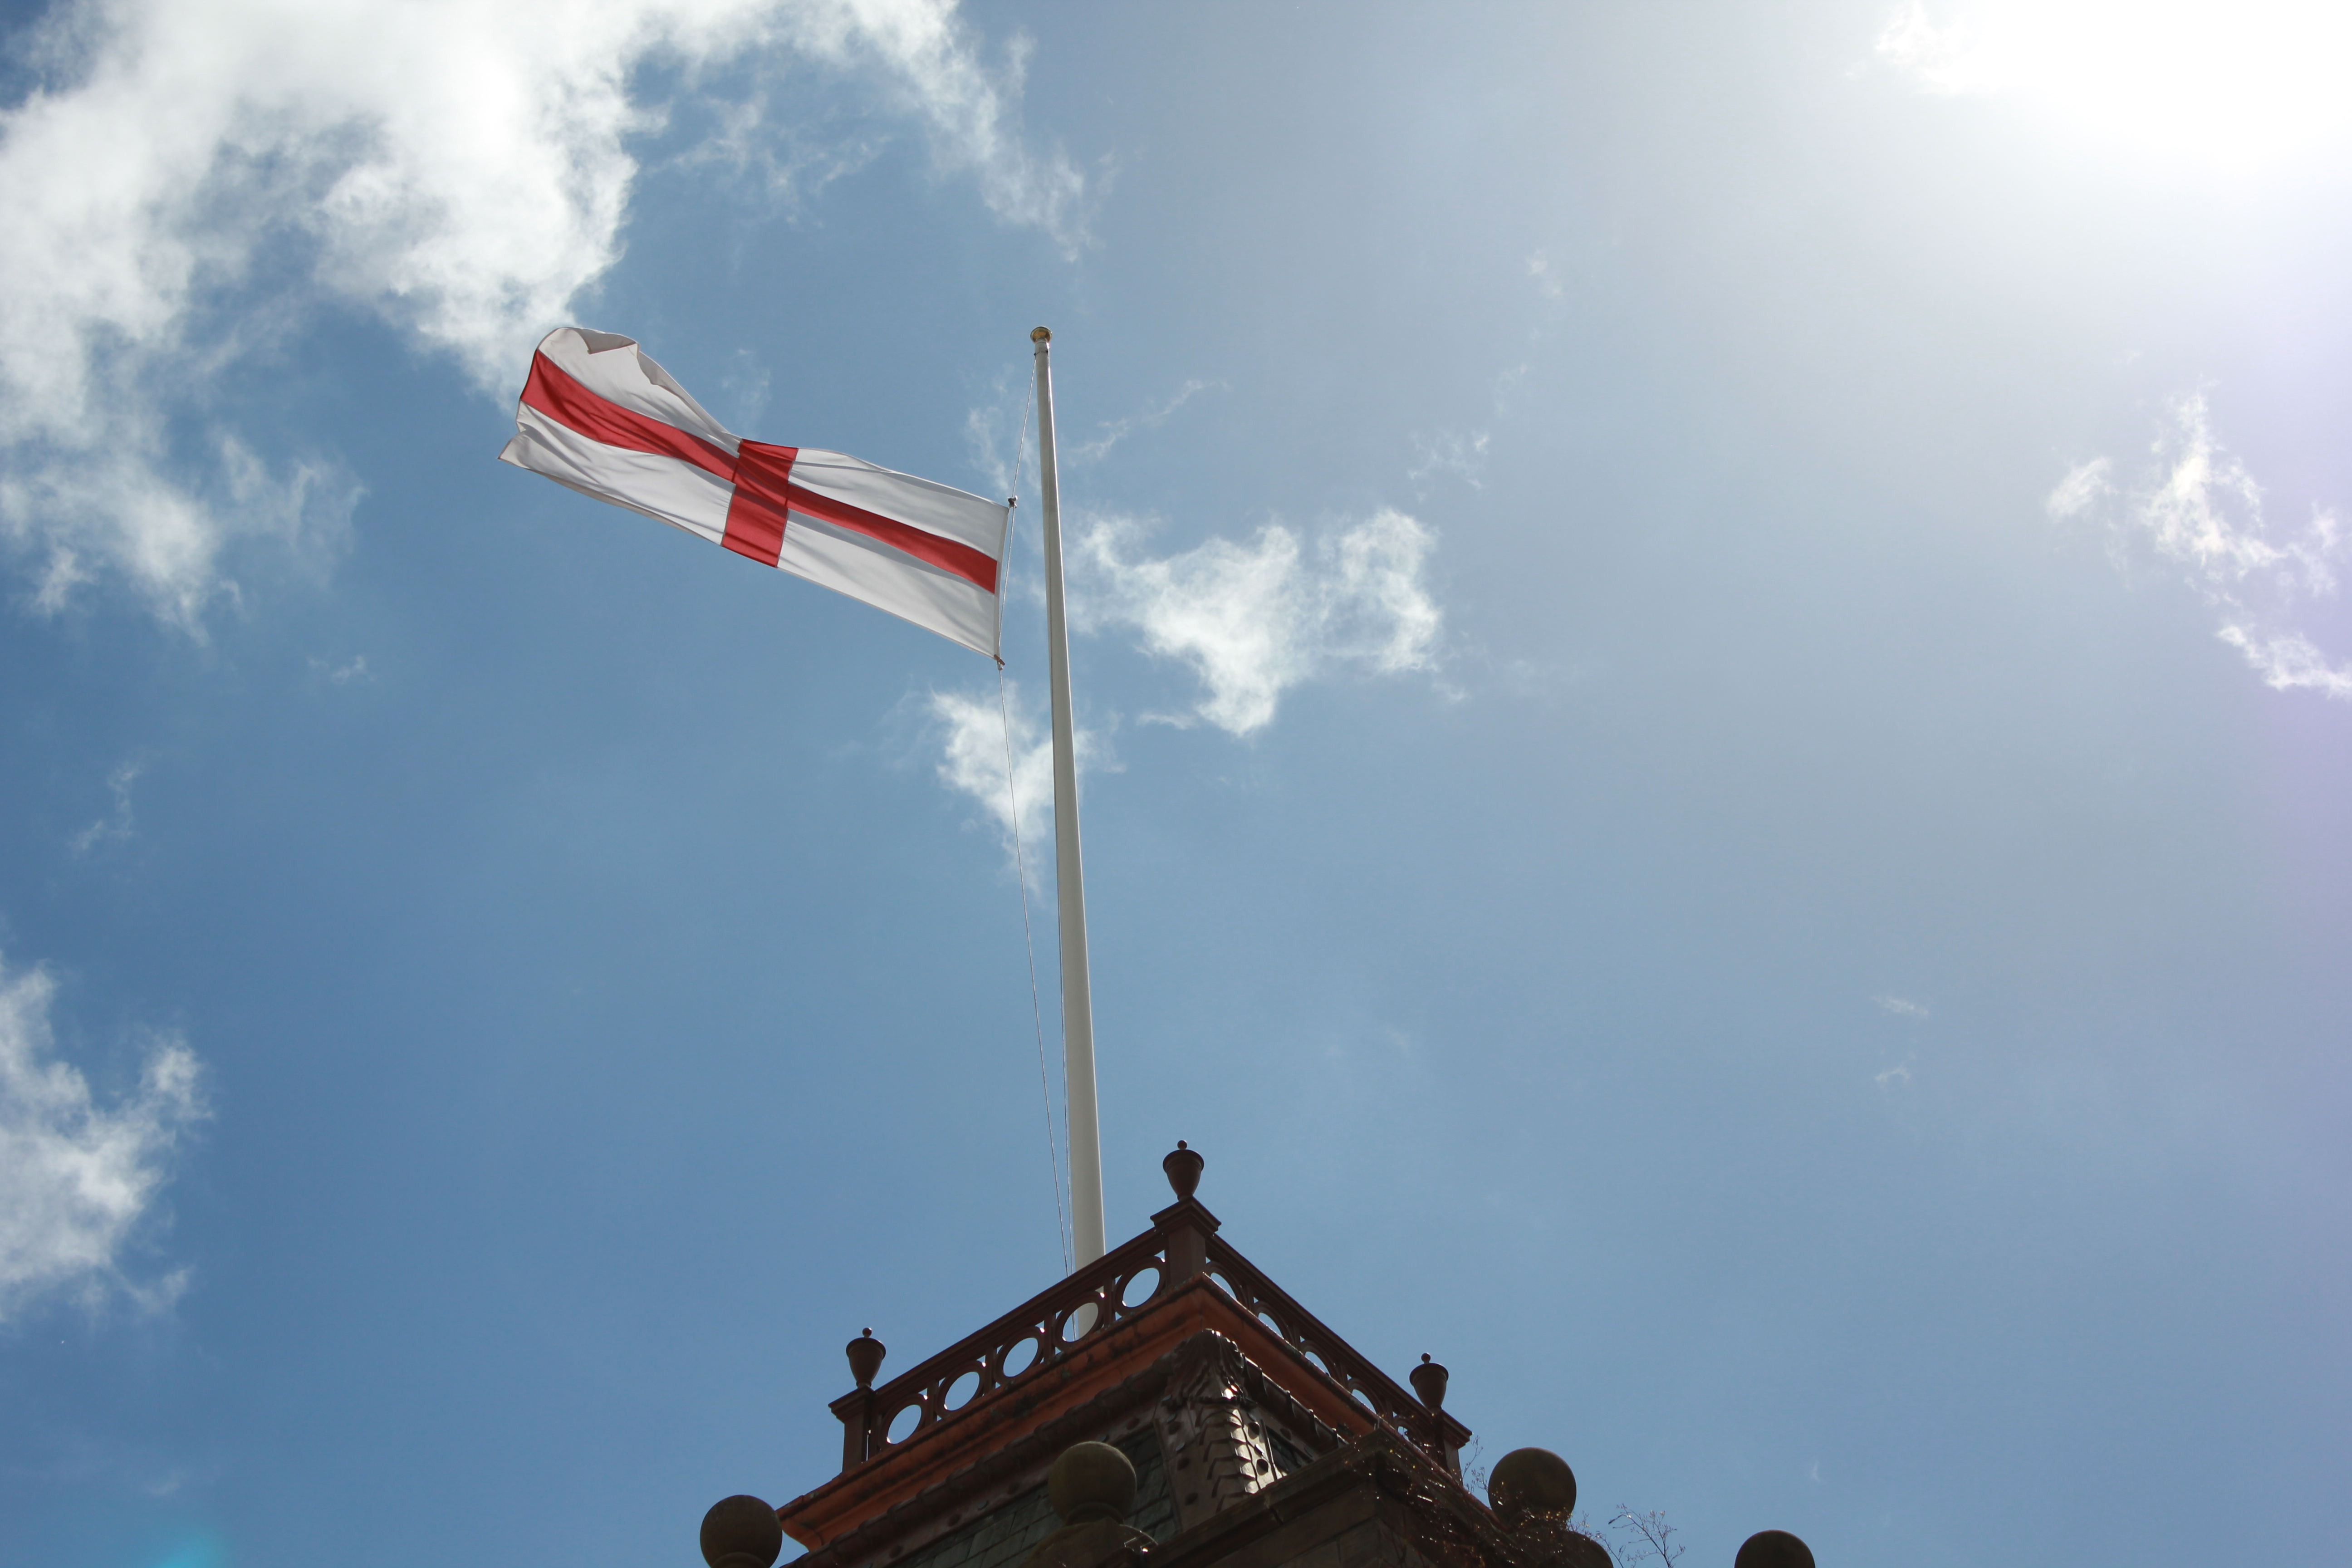 Pendle condemns attacks in Spain